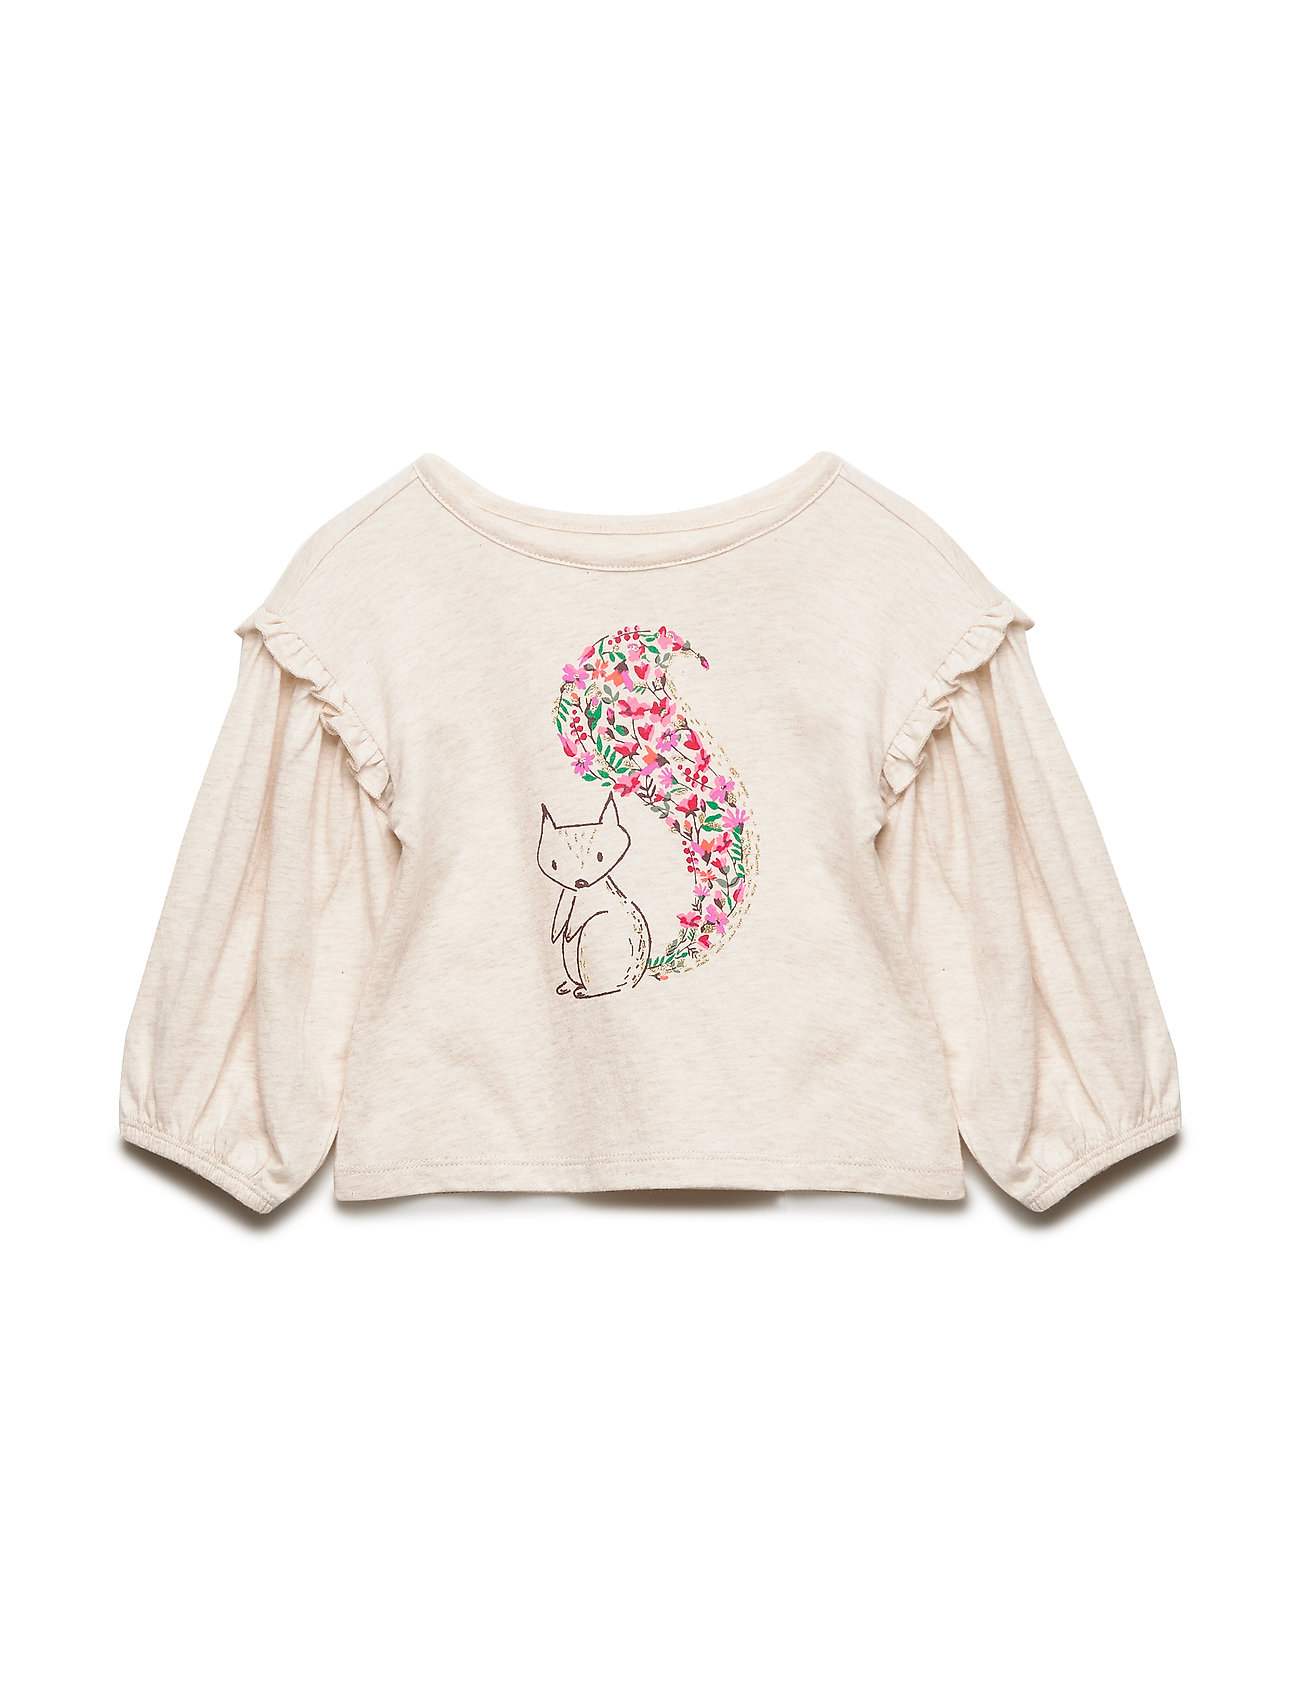 GAP Toddler Ruffle-Sleeve Graphic T-Shirt - B2621